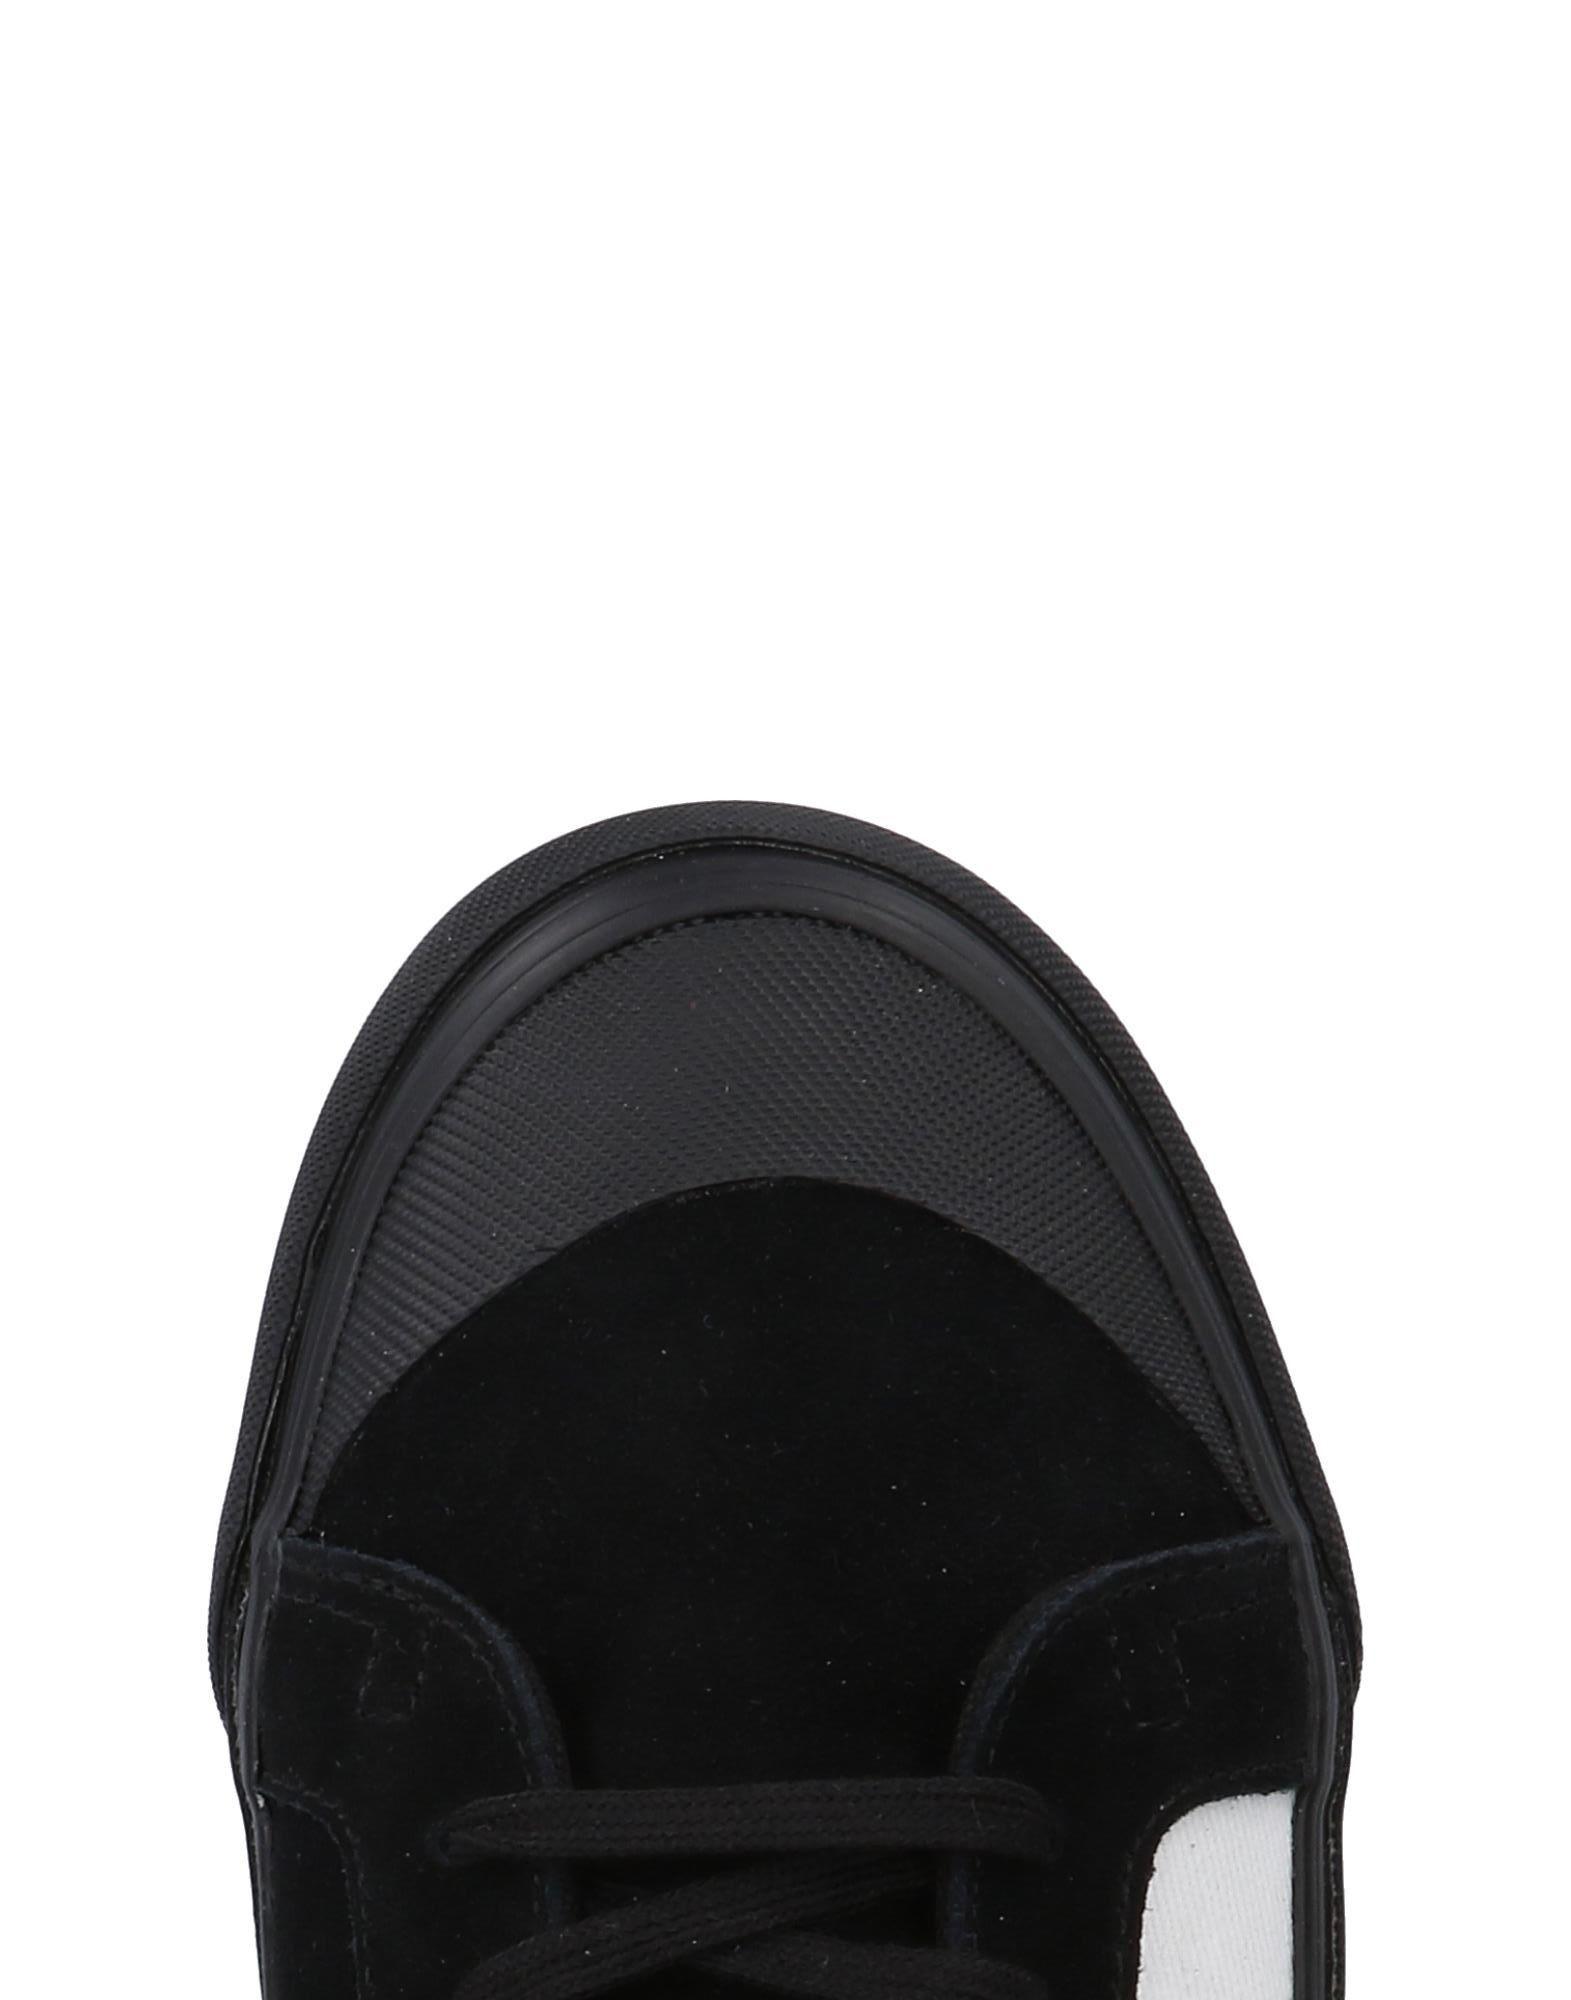 Vans Sneakers Herren  11498198QM Schuhe Gute Qualität beliebte Schuhe 11498198QM f4c1ea